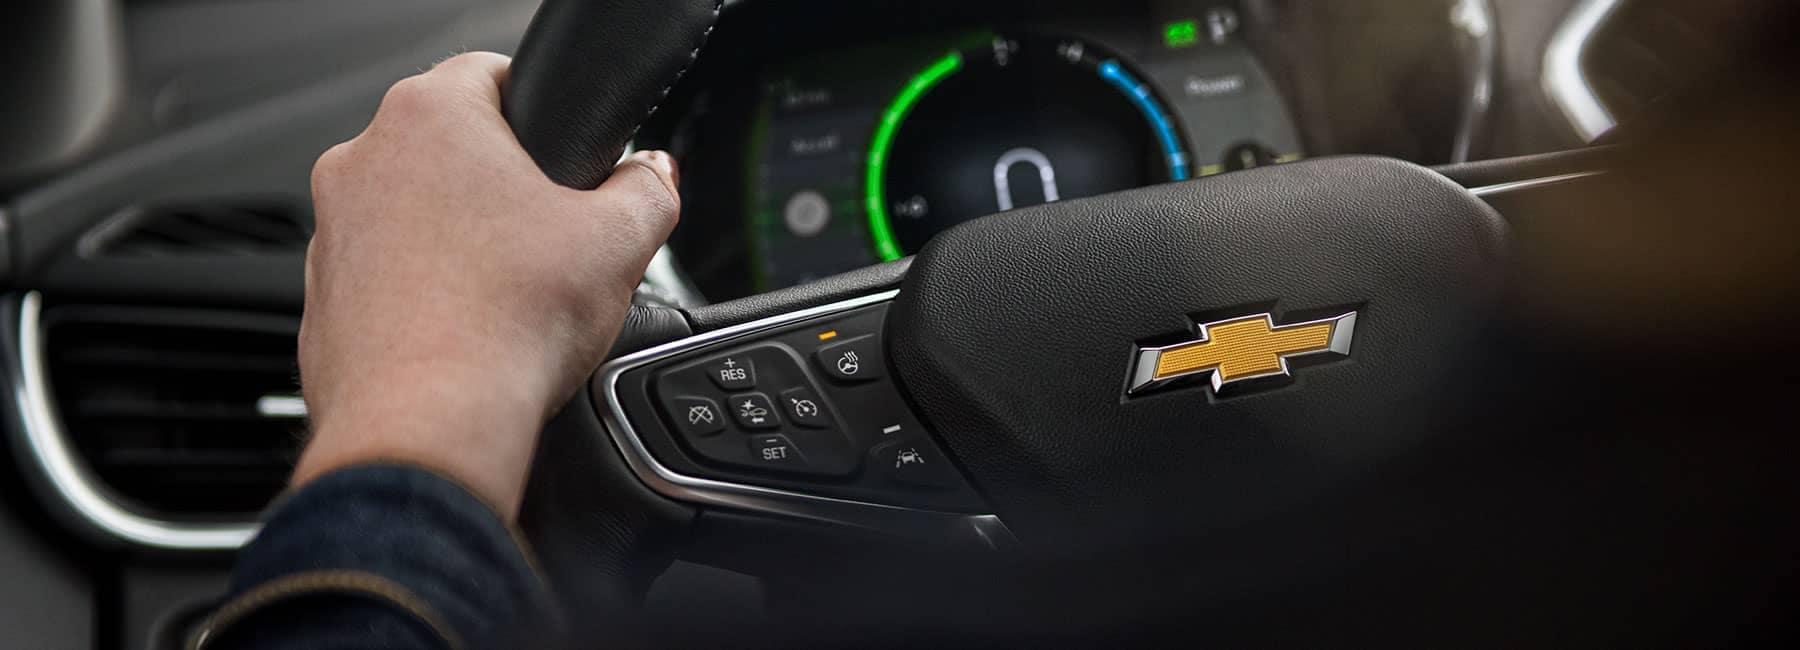 Chevrolet Interior Wheel and Dashboard